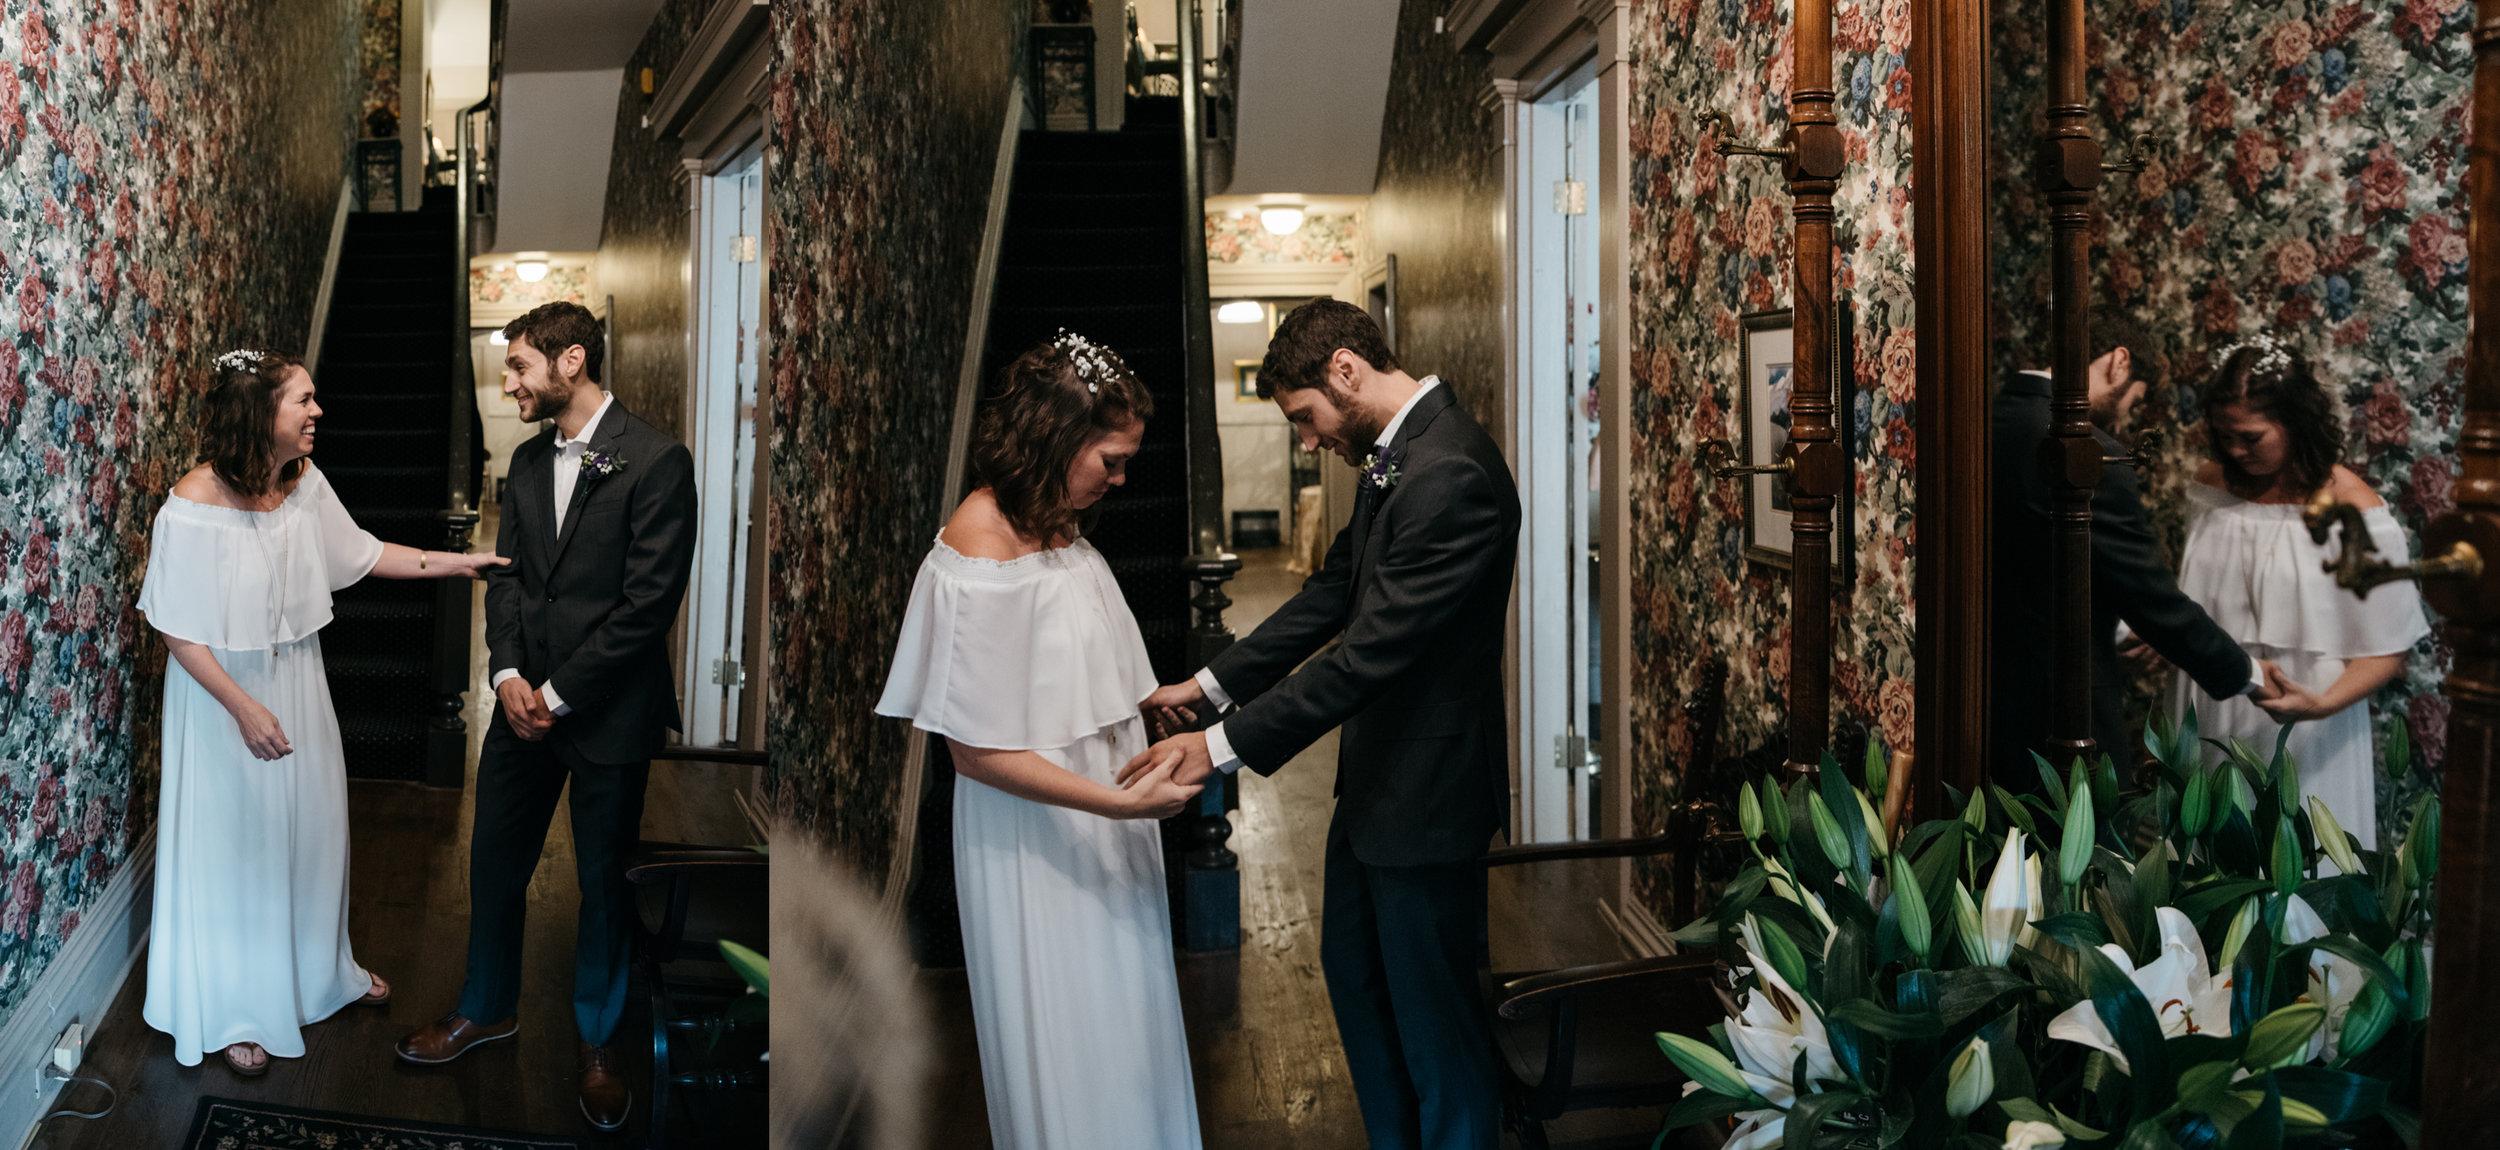 first look, morning glory inn, pittsburgh wedding photography.jpg